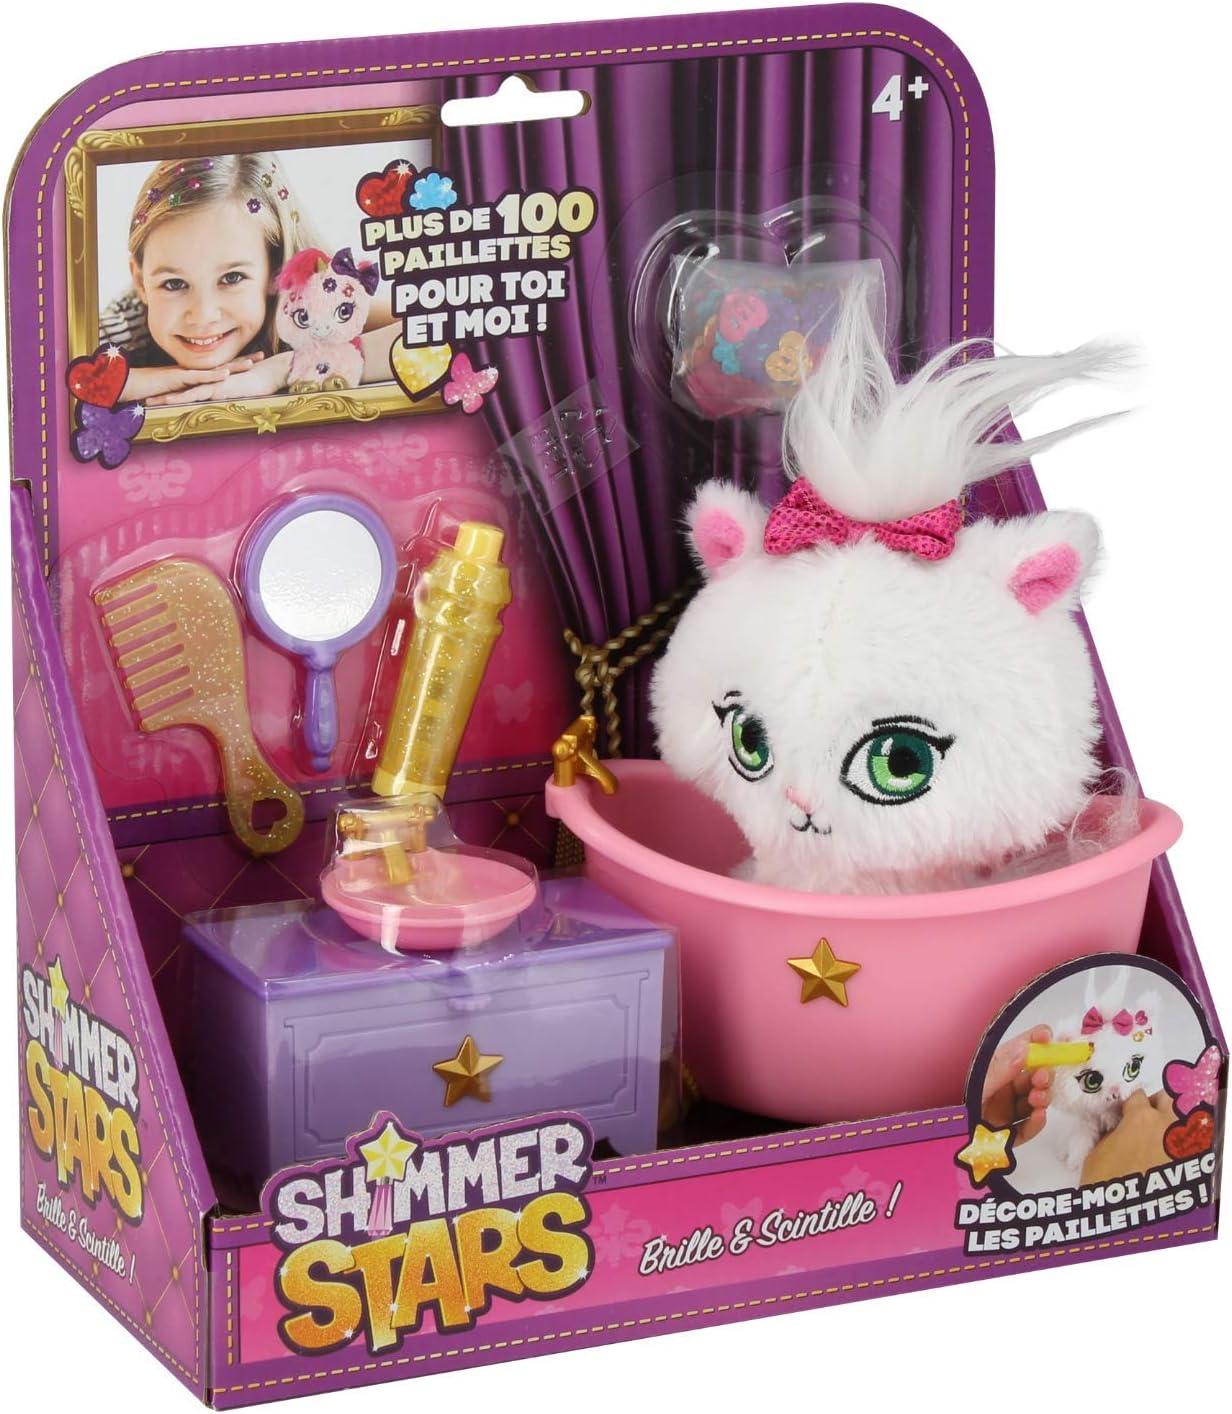 Taldec Shimmer Stars-My Cat Bathroom 35% OFF £10.19 @ Amazon